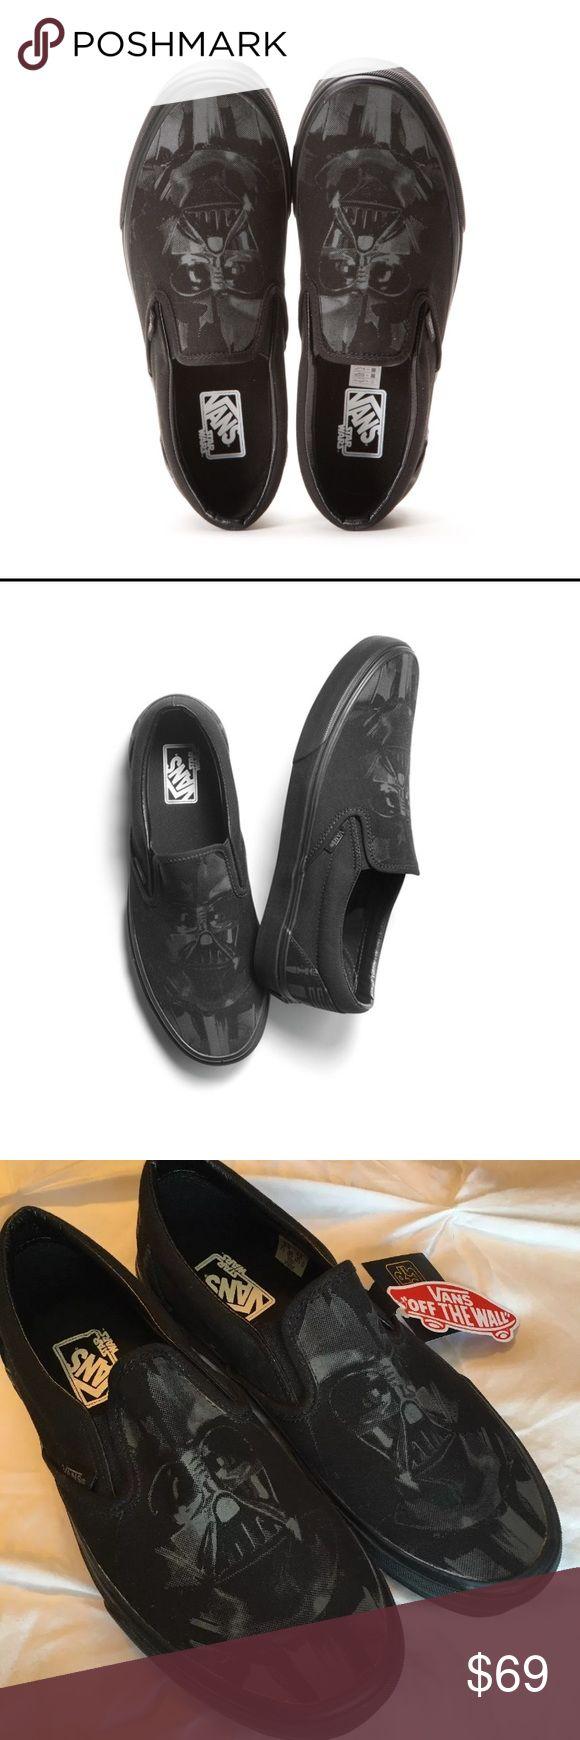 VANS Star Wars Darth Vader classic black slip-on VANS Star Wars Darth Vader classic black slip-on shoe.  Unisex men's size 6.5, women's size 8. NWOB. Vans Shoes